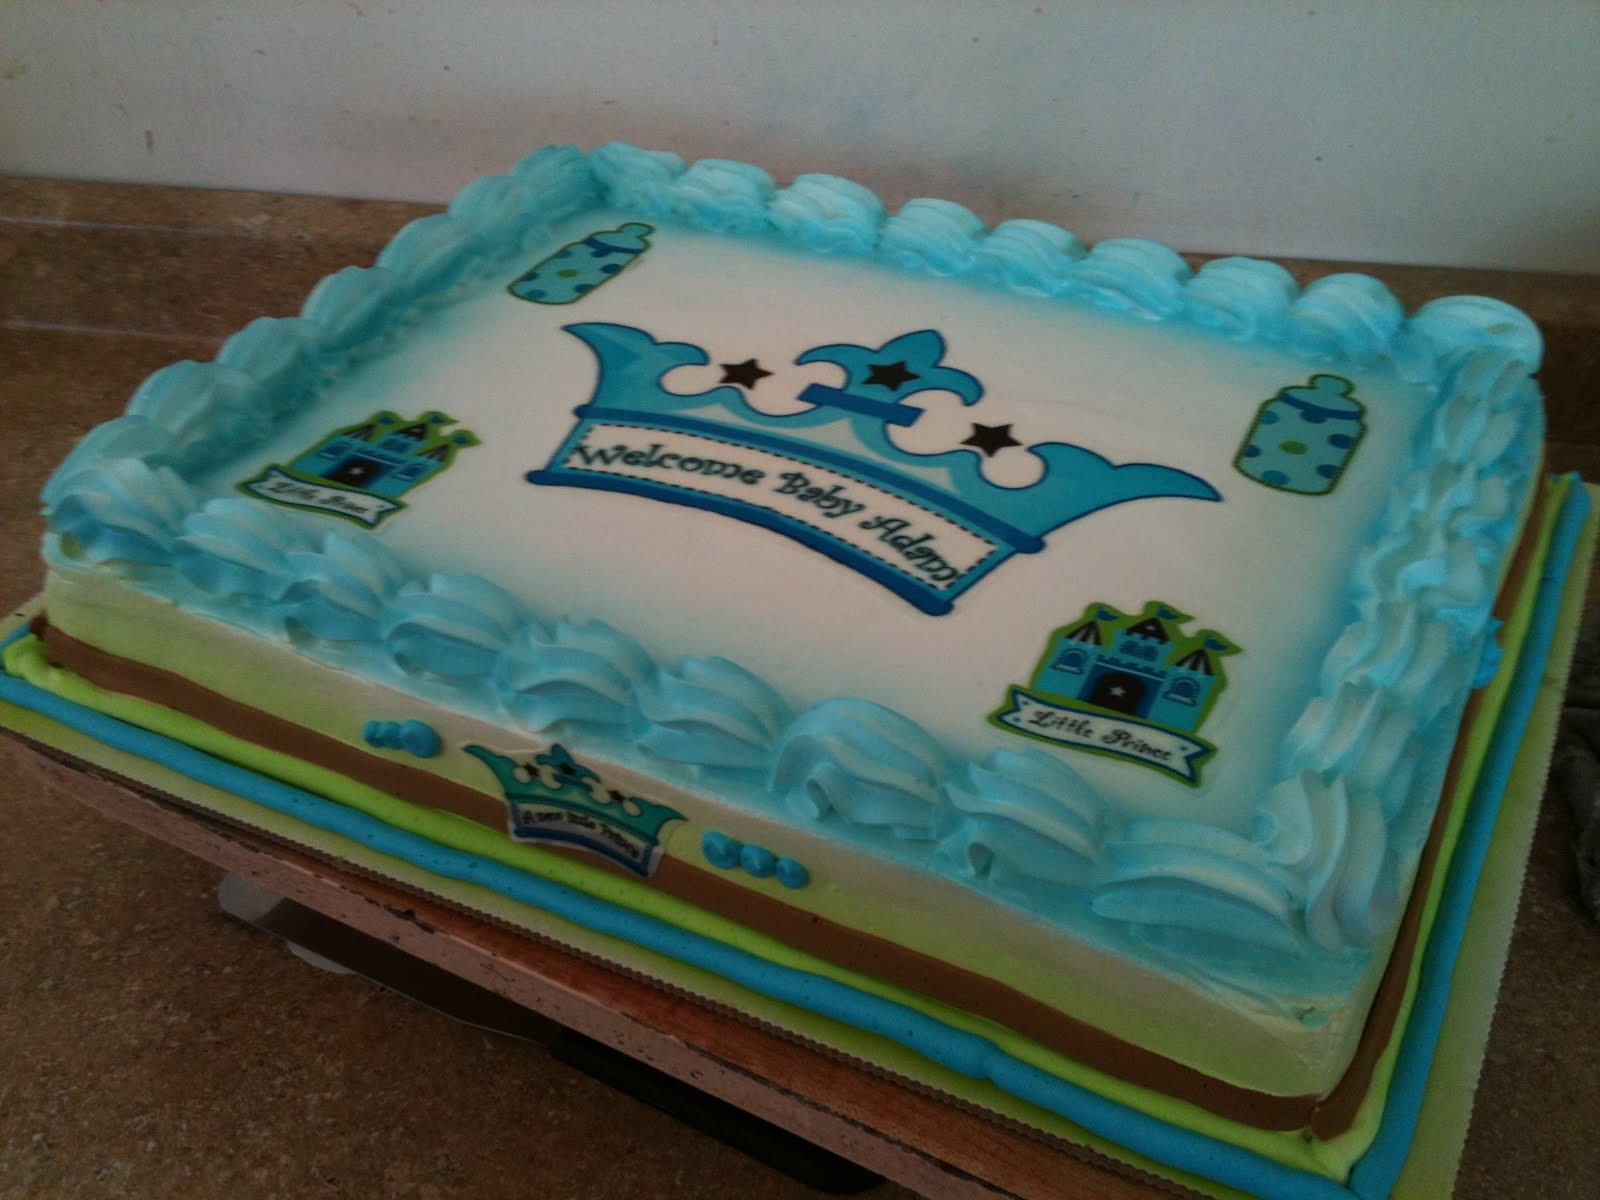 Hector s Custom Cakes boy baby prince baby shower